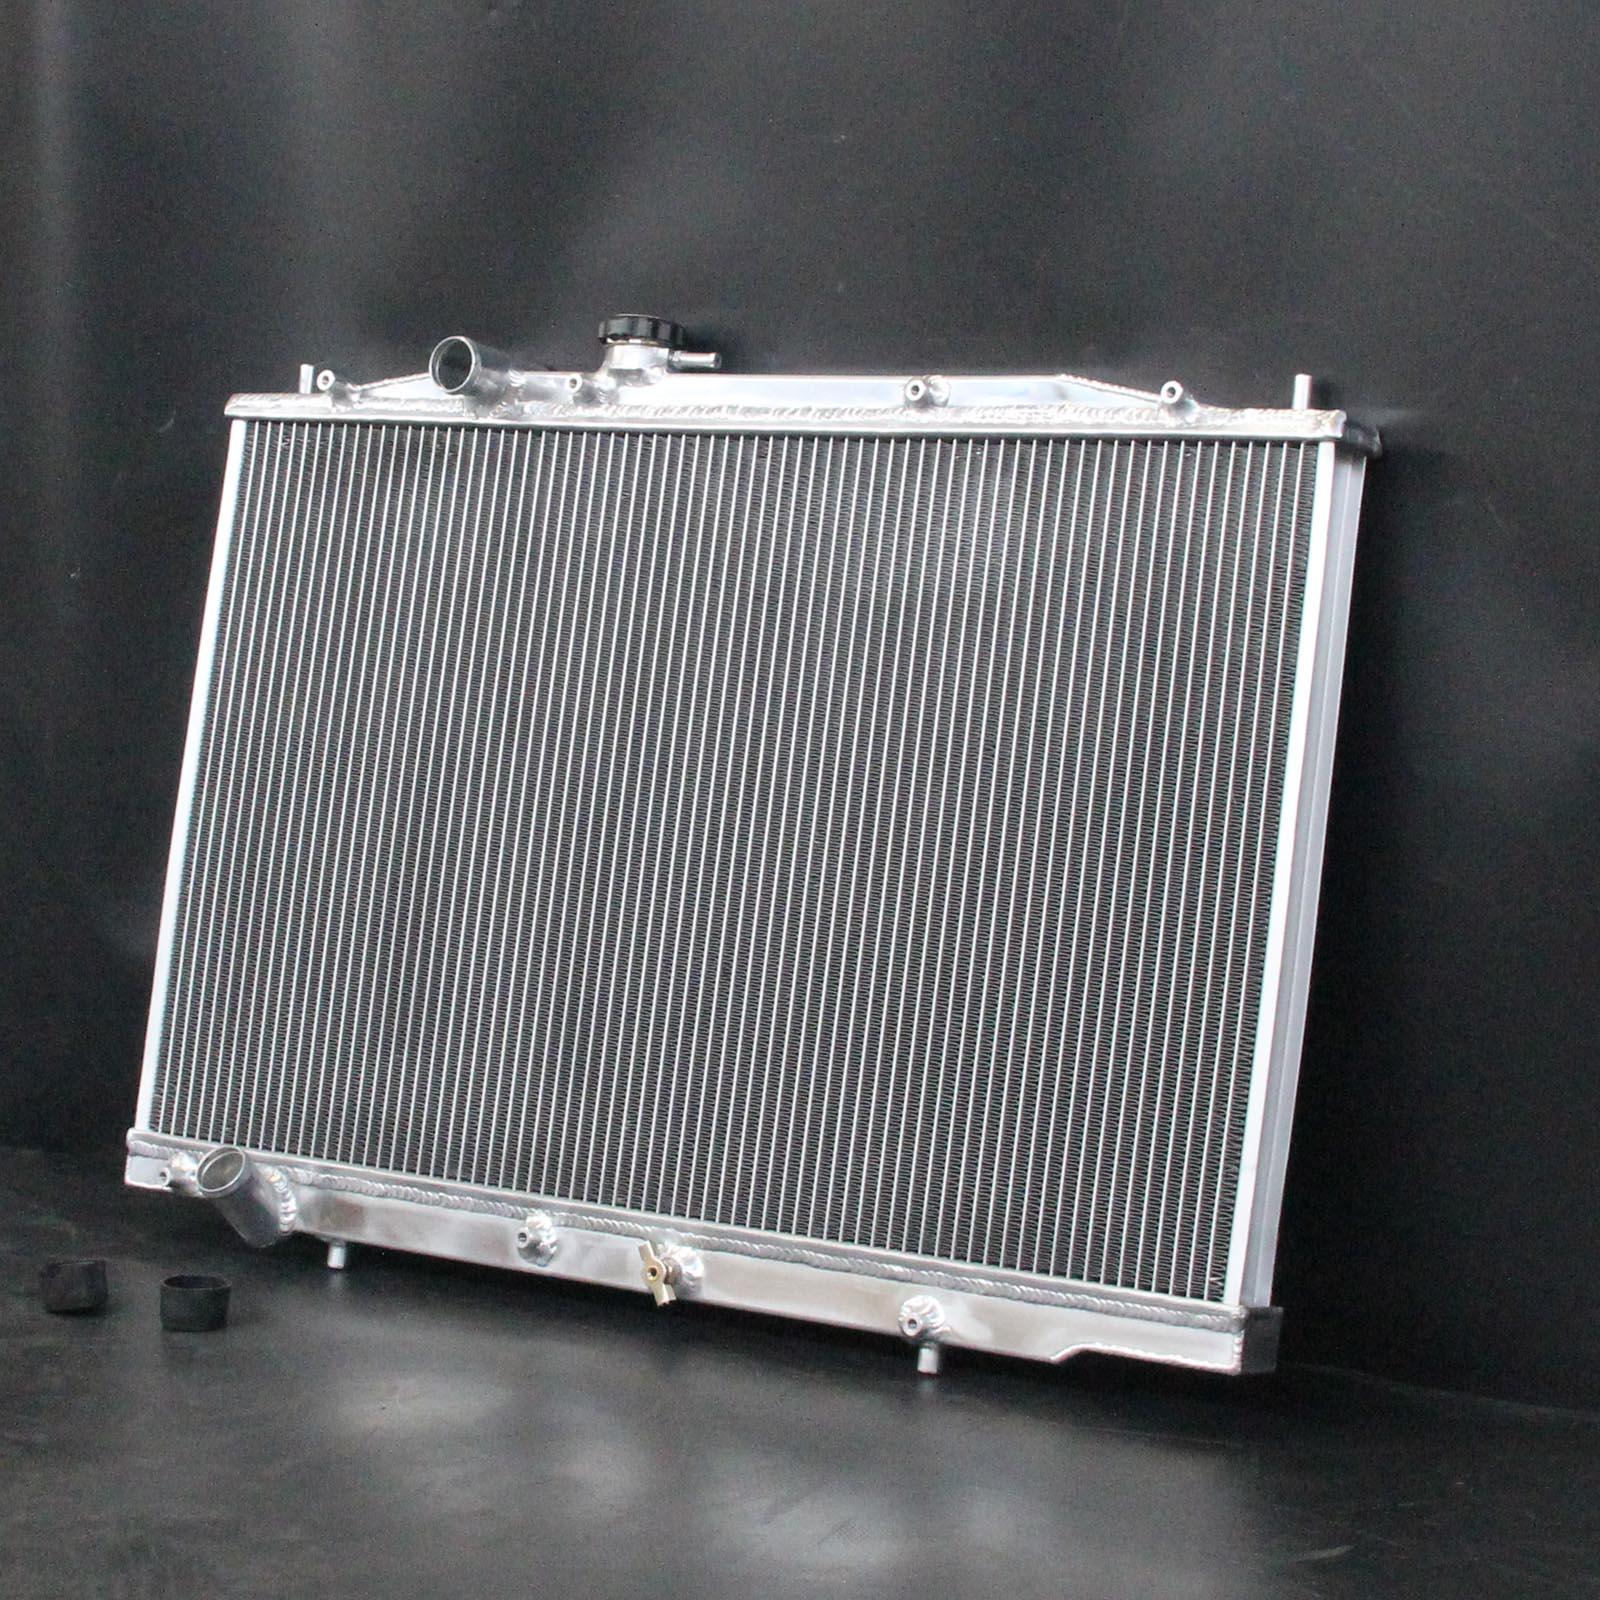 ALUMINUM RADIATOR FOR 2004-2008 ACURA TL 3.2L V6 J32A3 2005 2006 2007 MT 04-08